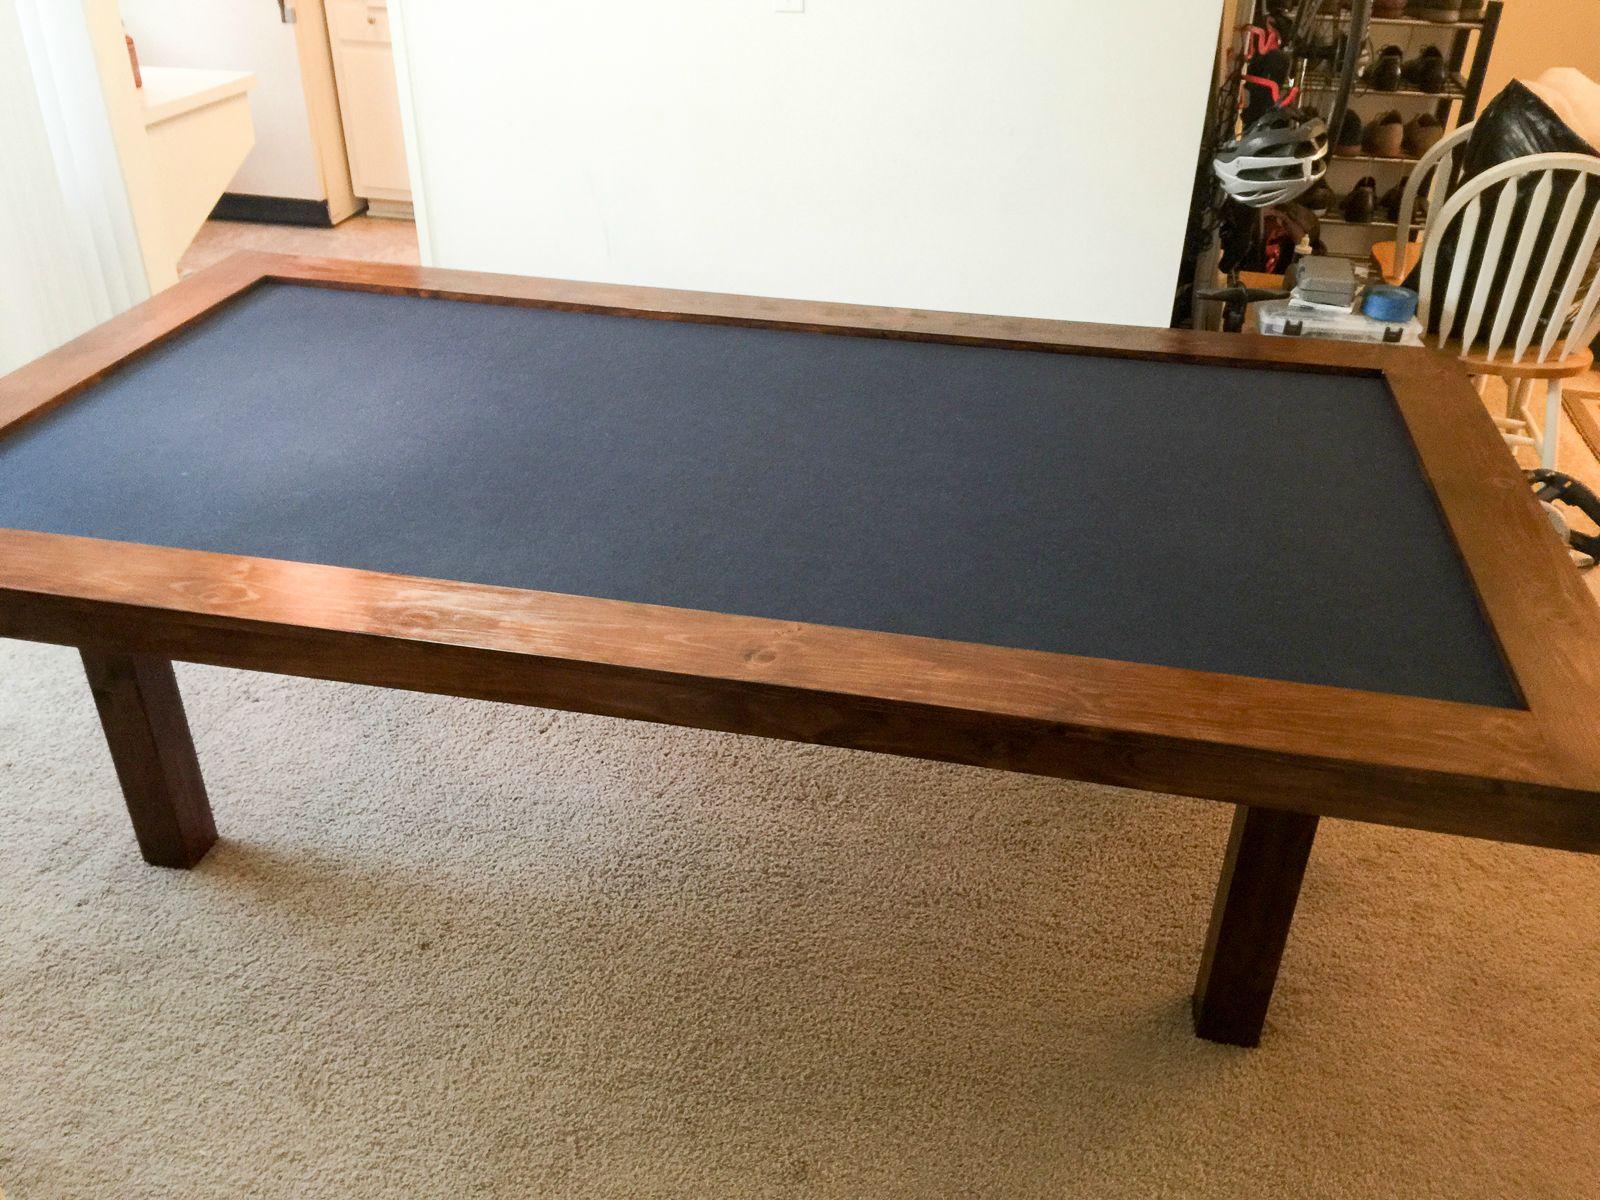 board_game_table_452015_001.jpg